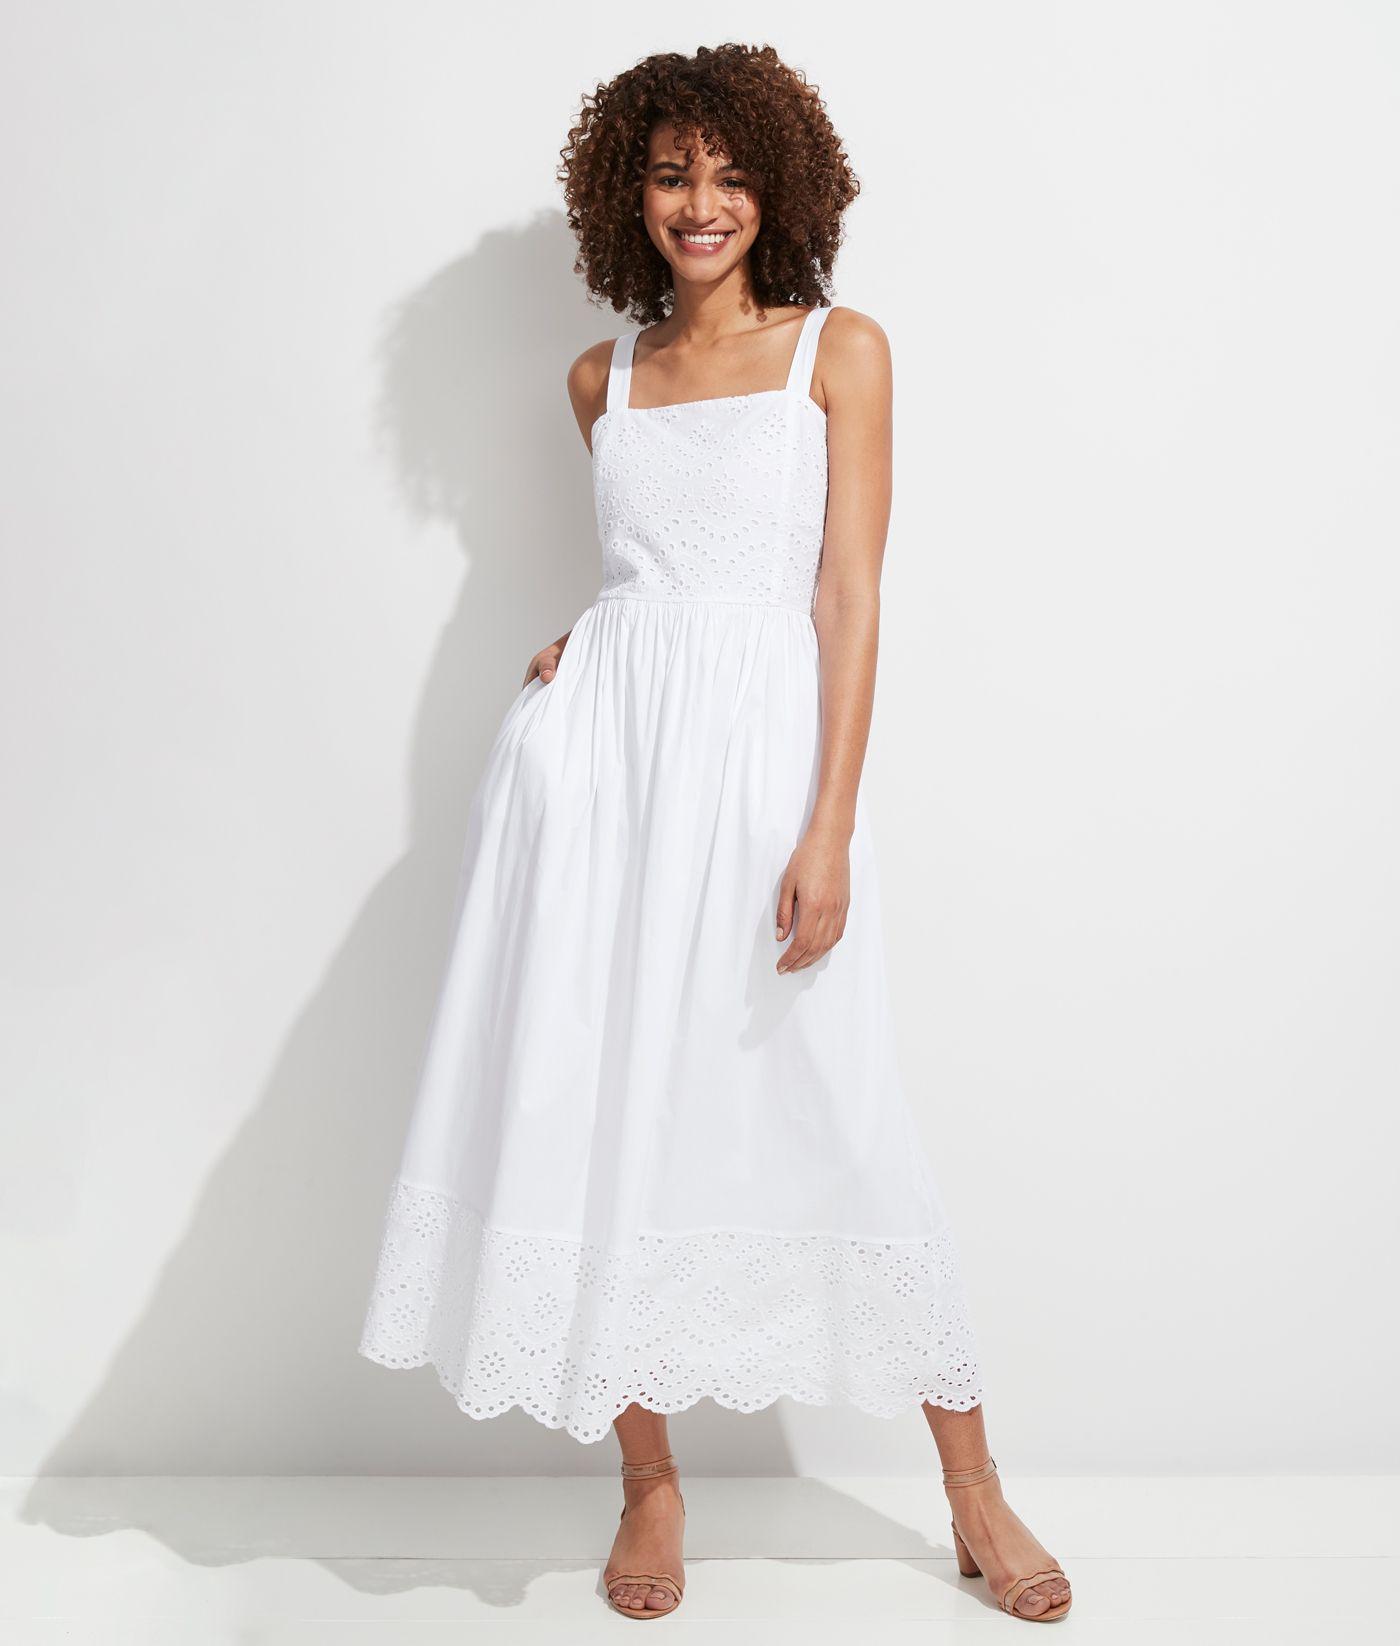 Pin On Dresses Skirts [ 1646 x 1400 Pixel ]